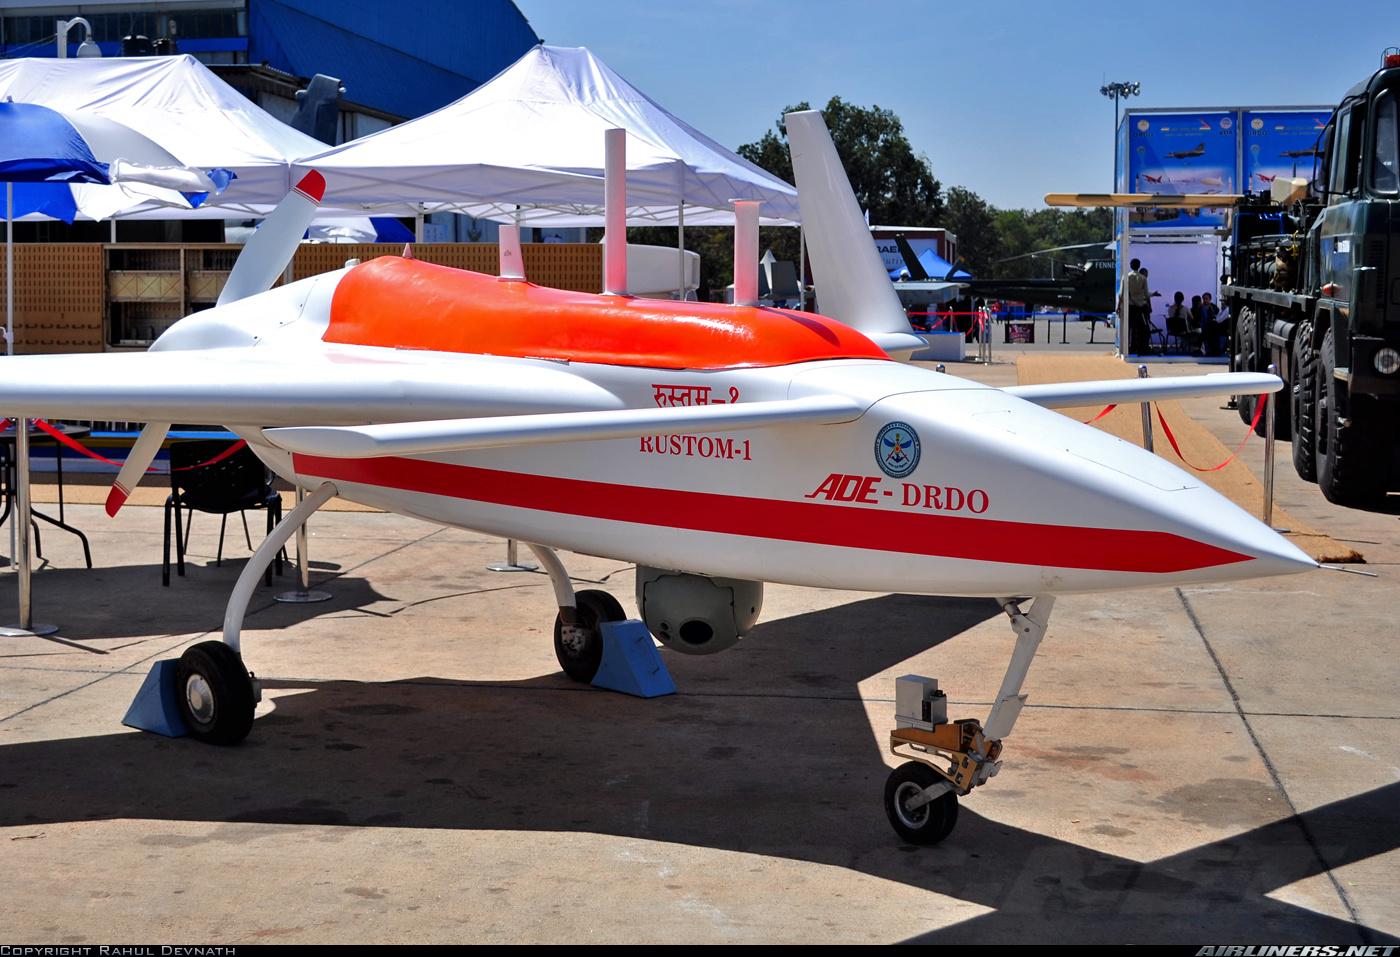 Image result for DRDO Rustom 1